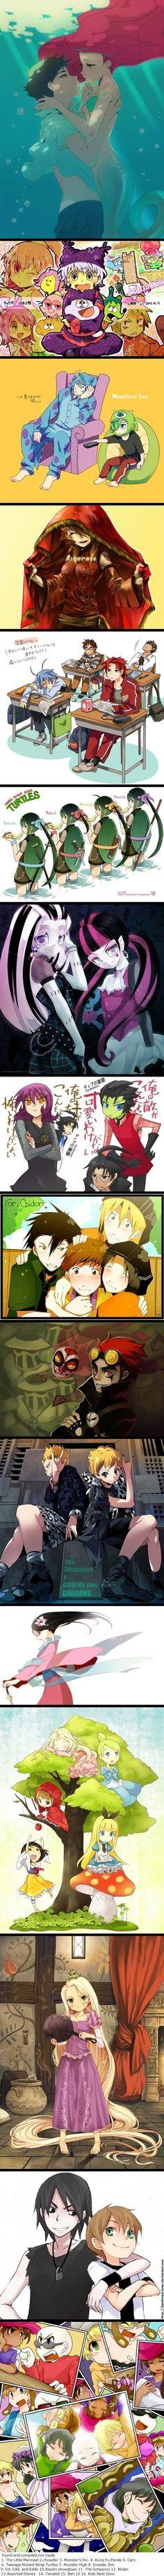 CartooN /DisNeY ---> Anime, makes everything look even better